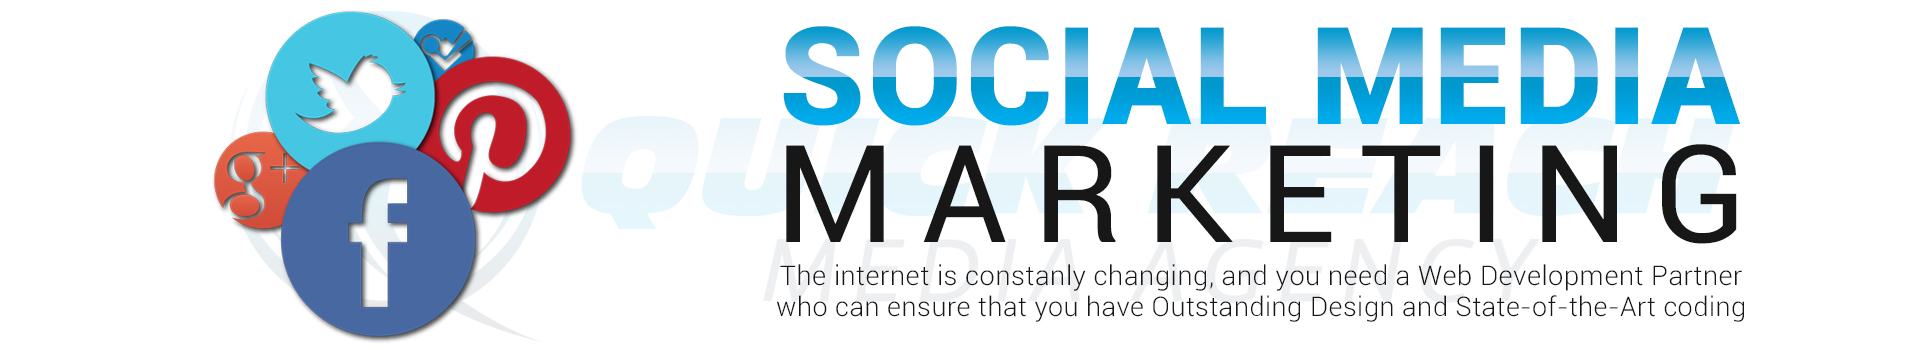 Social Media Marketing & Management Services